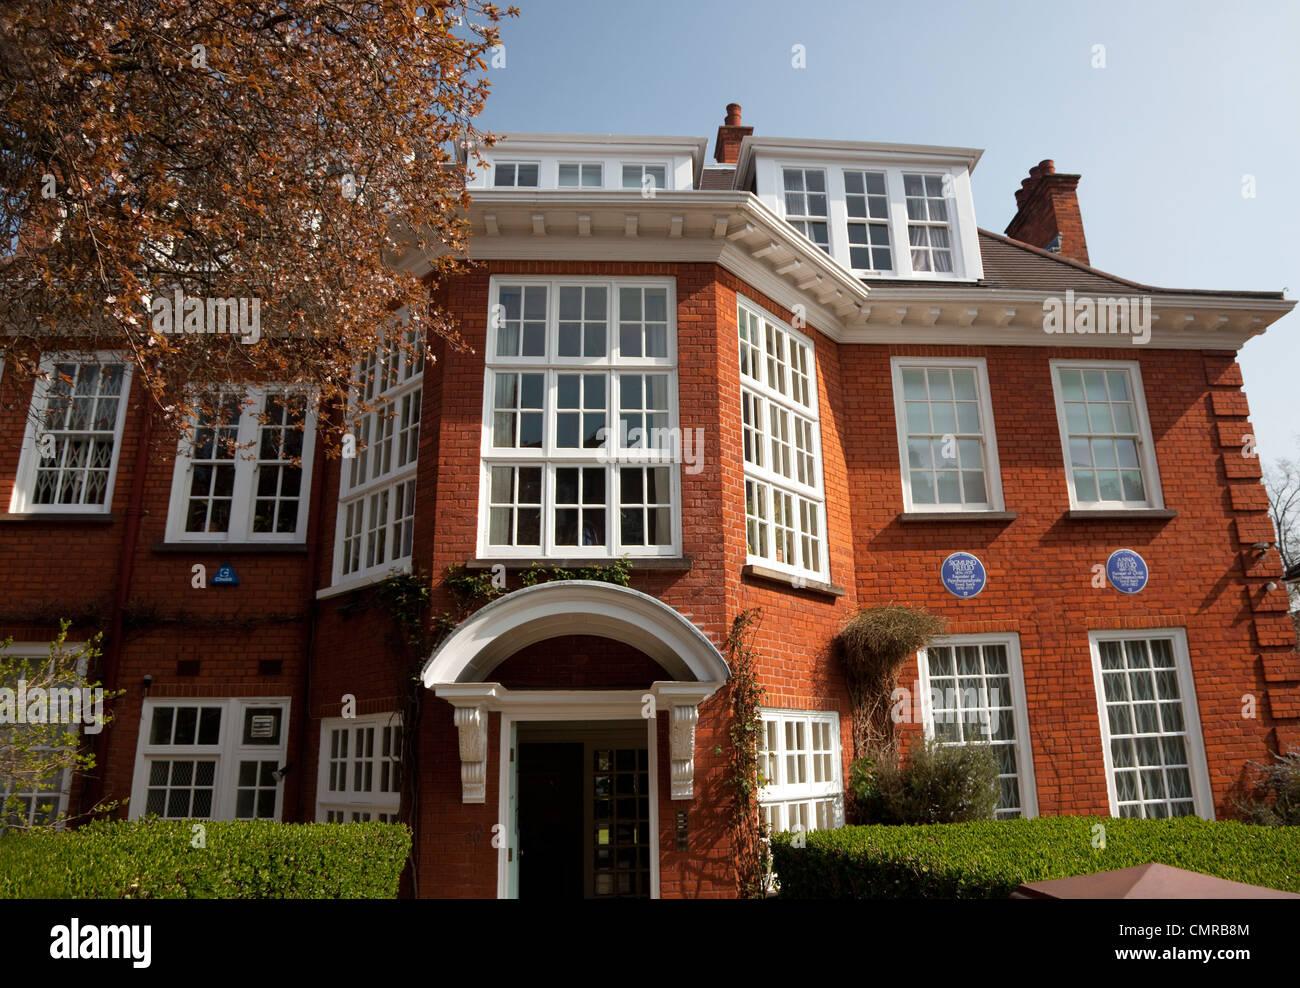 Freud Museum, Hampstead, London (former home of Sigmund Freud) - Stock Image